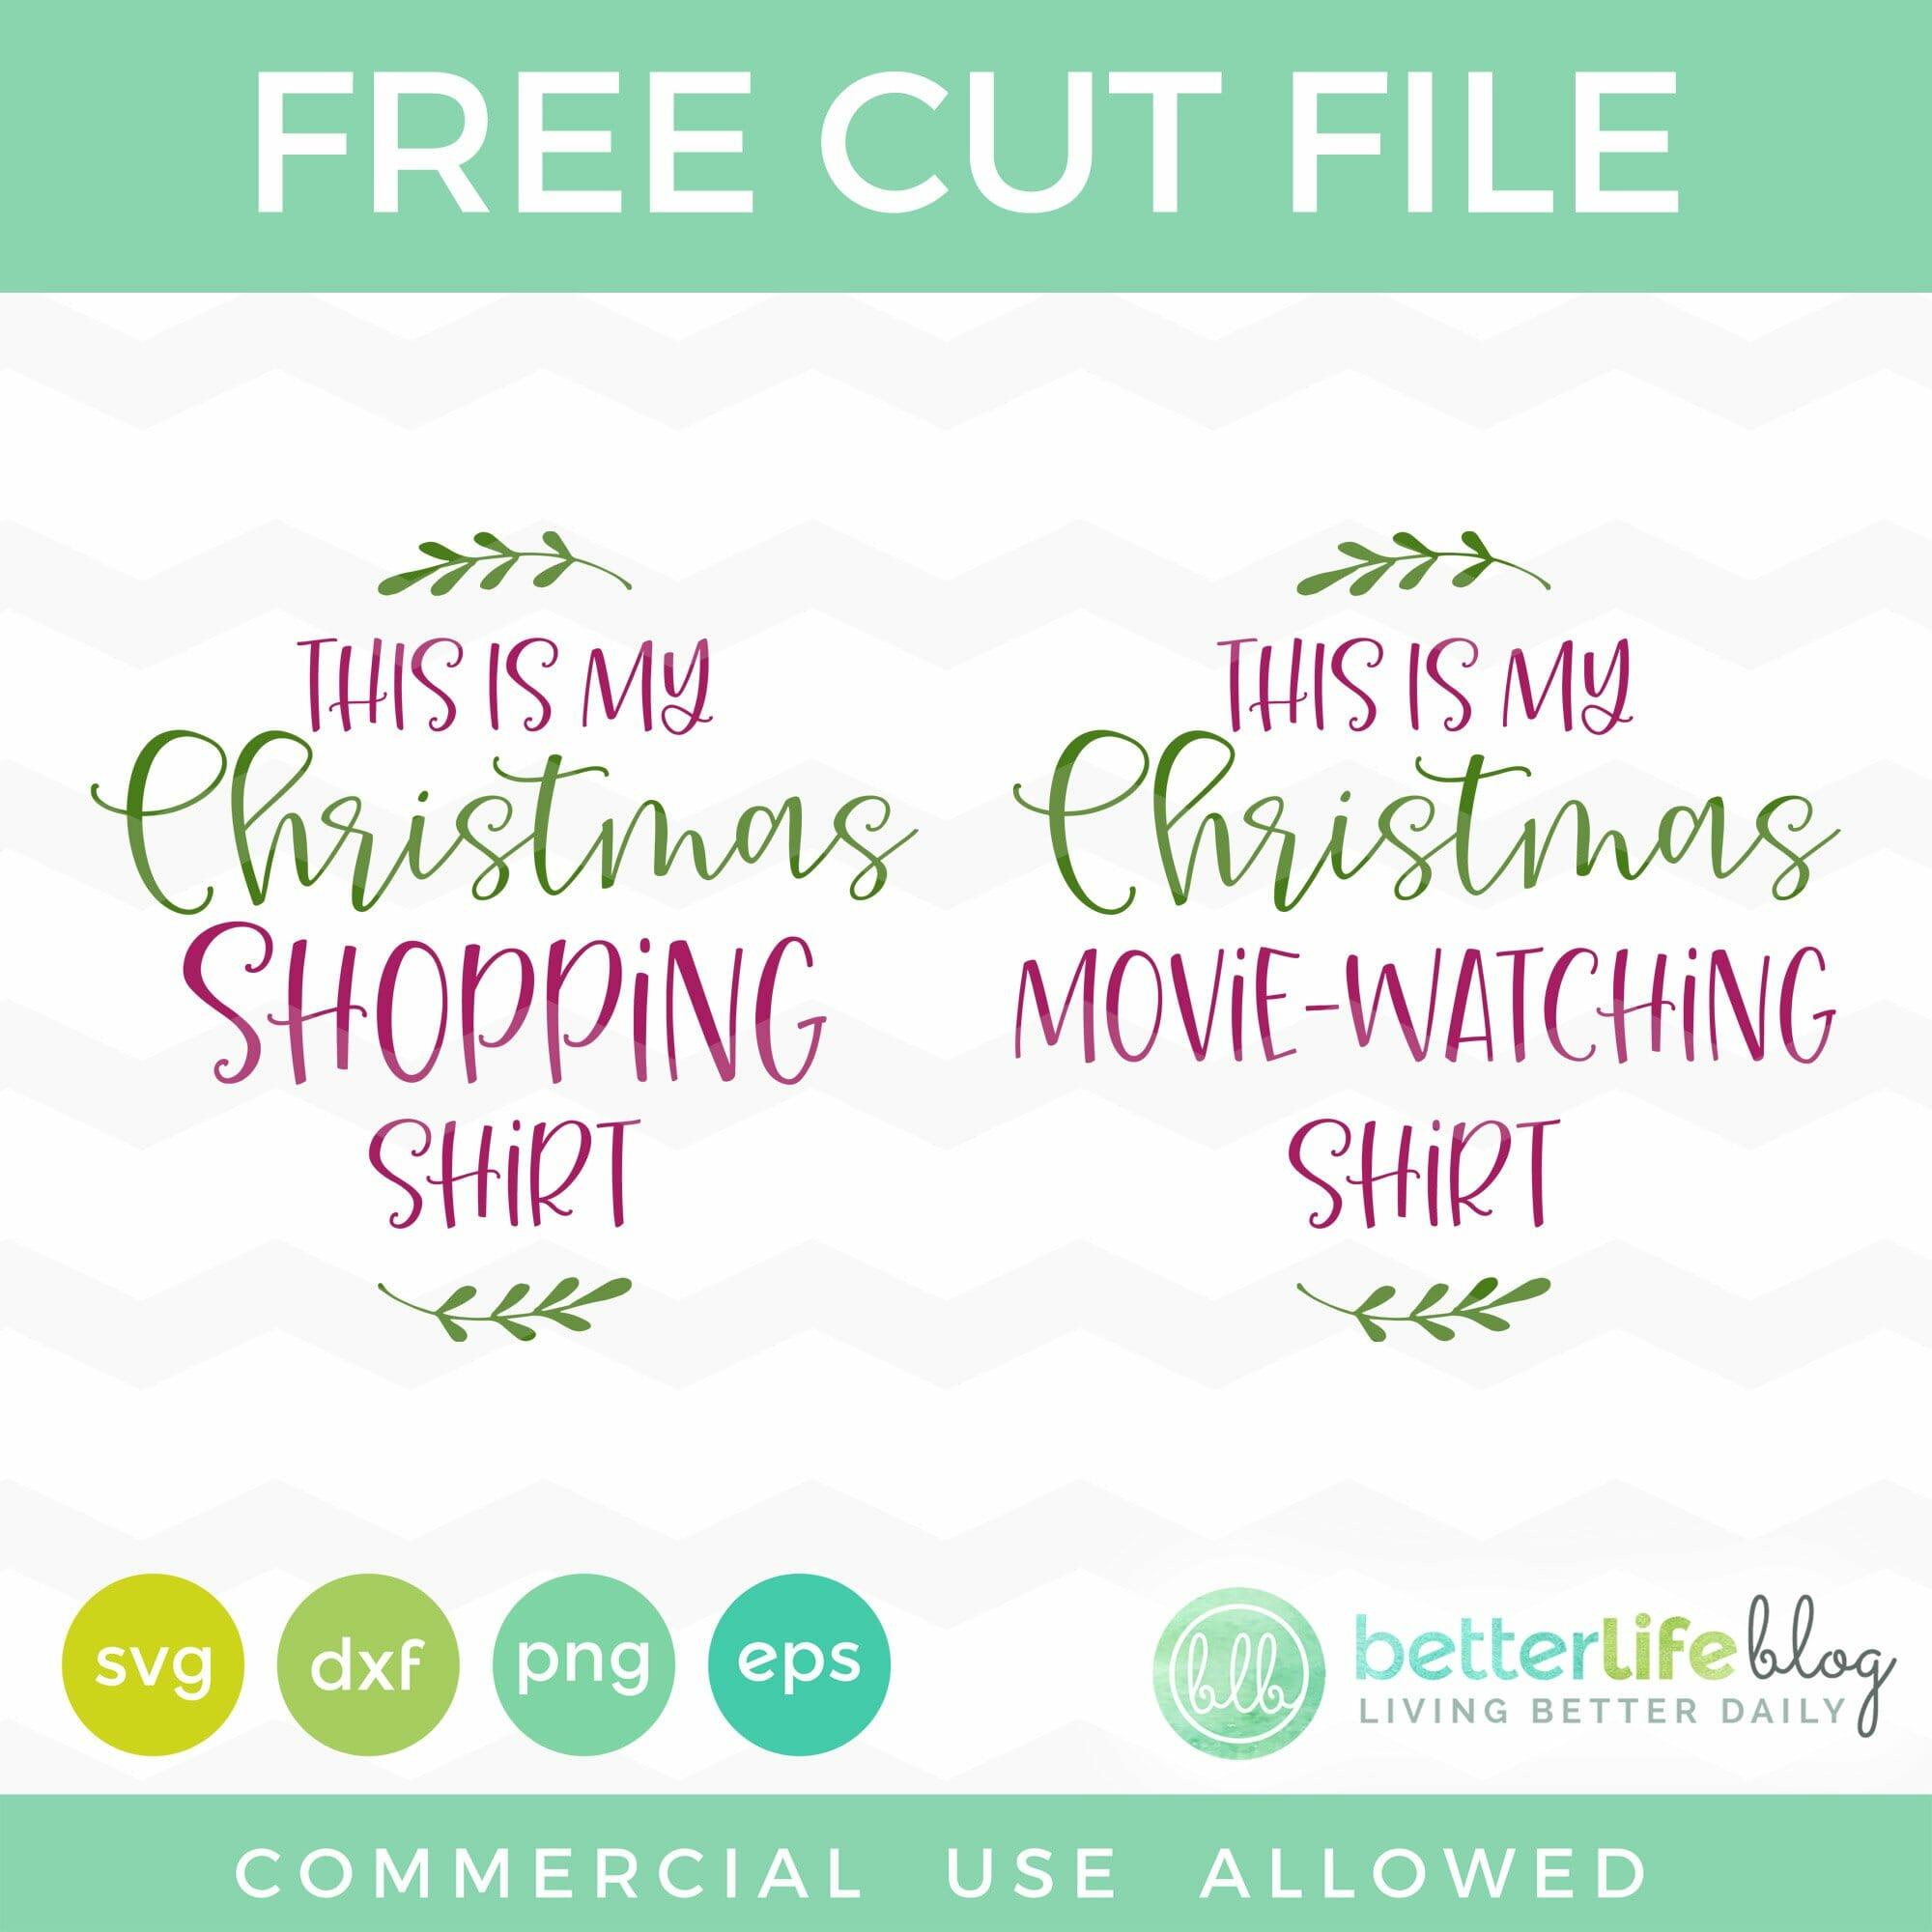 Cricut Project My Christmas Shopping Shirt And Christmas Movie Watching Shirt Free Svg Cut File Better Life Blog